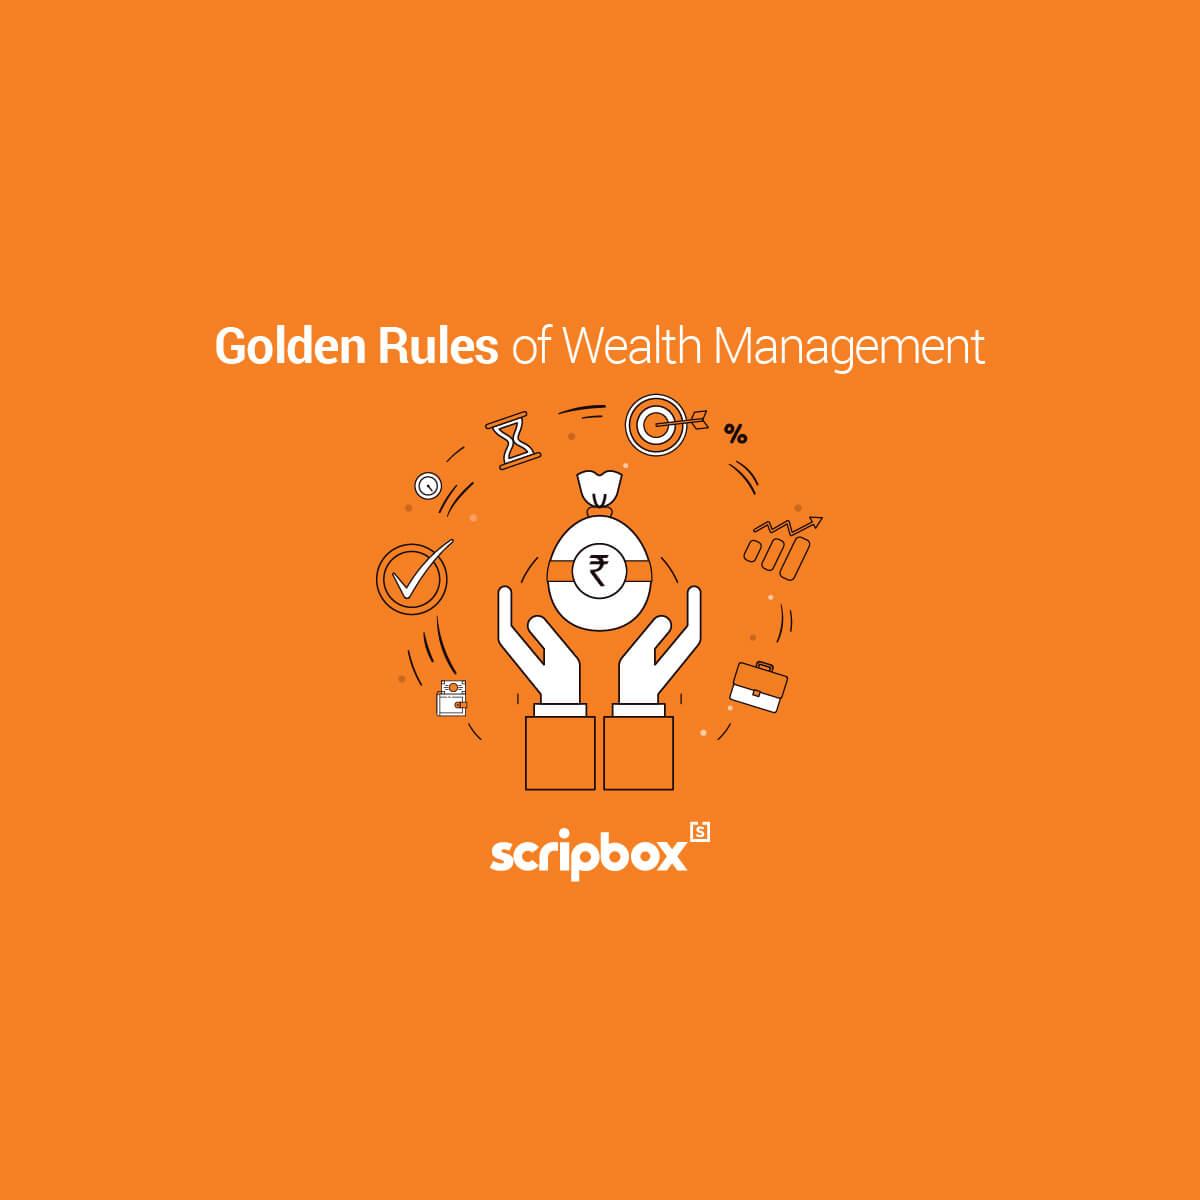 golden rules of wealth management